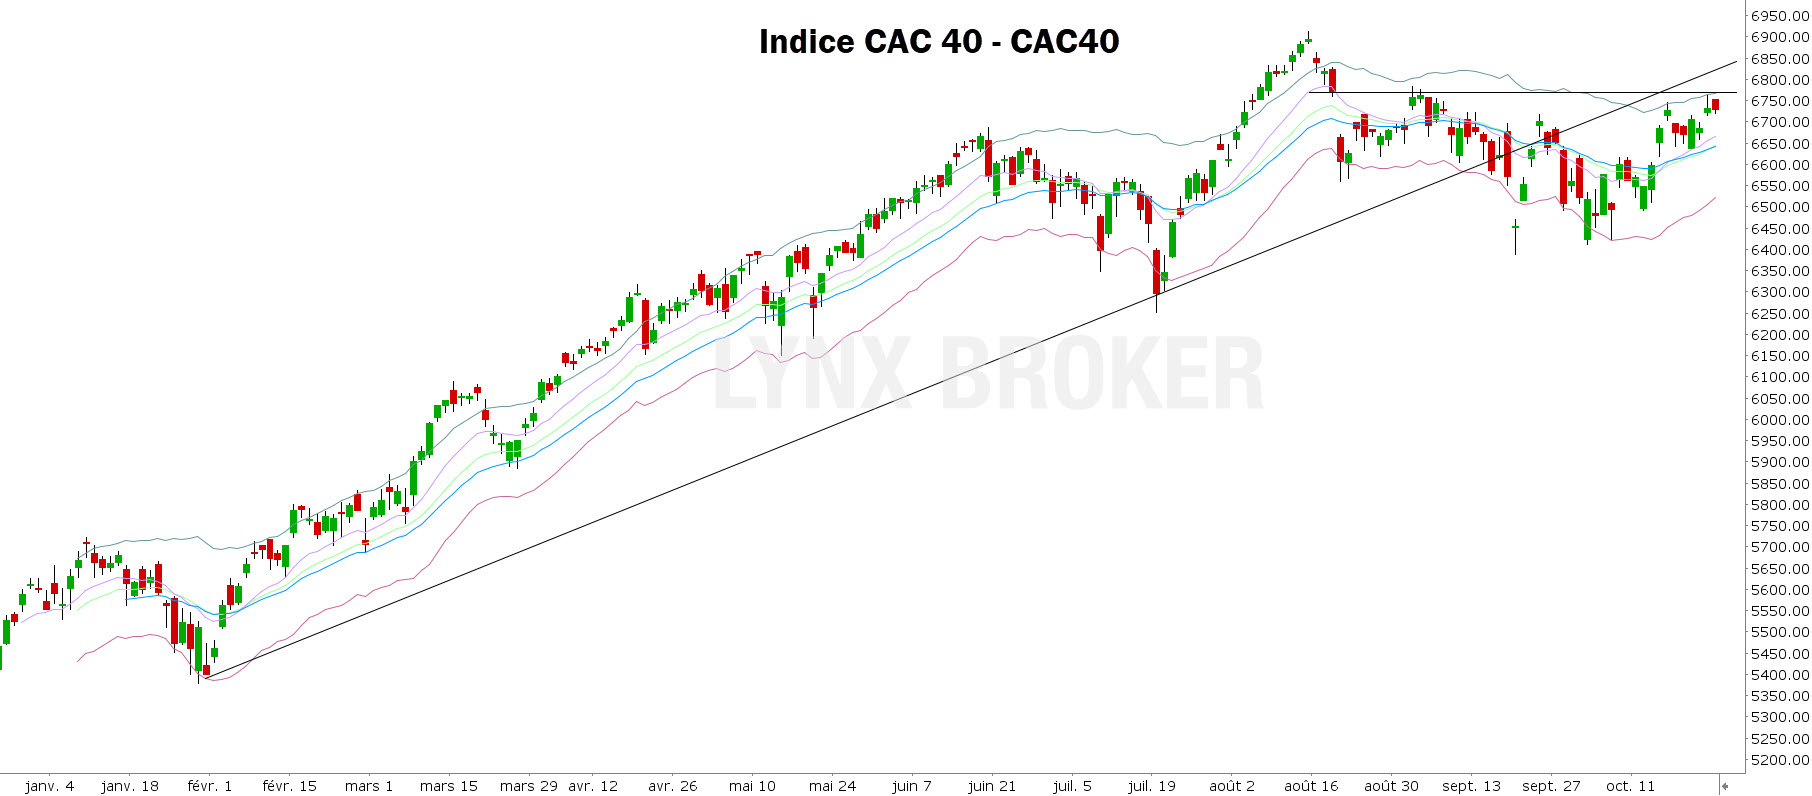 analyse technique CAC 40 - indice CAC 40 - 25102021